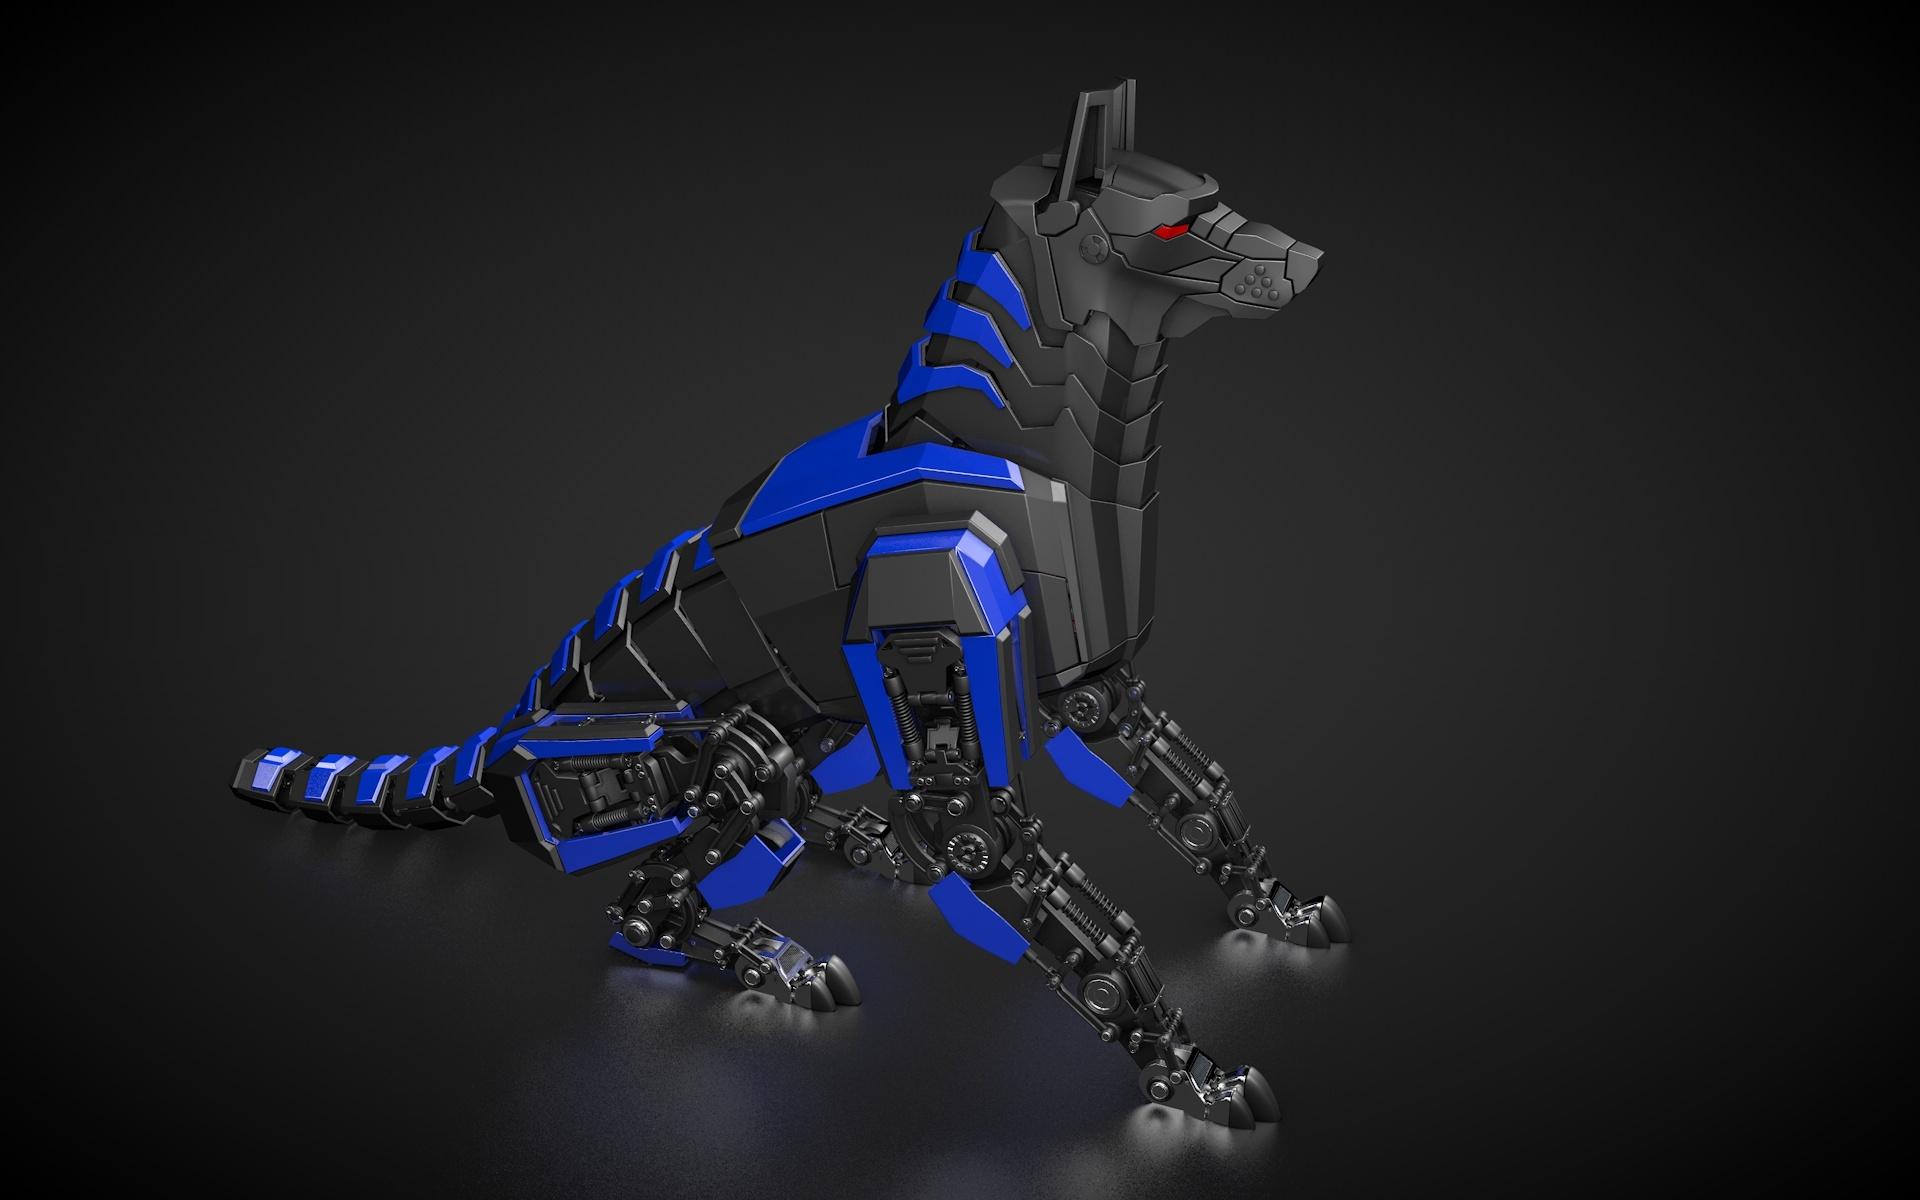 Robot Dog By Vladim00719 3docean